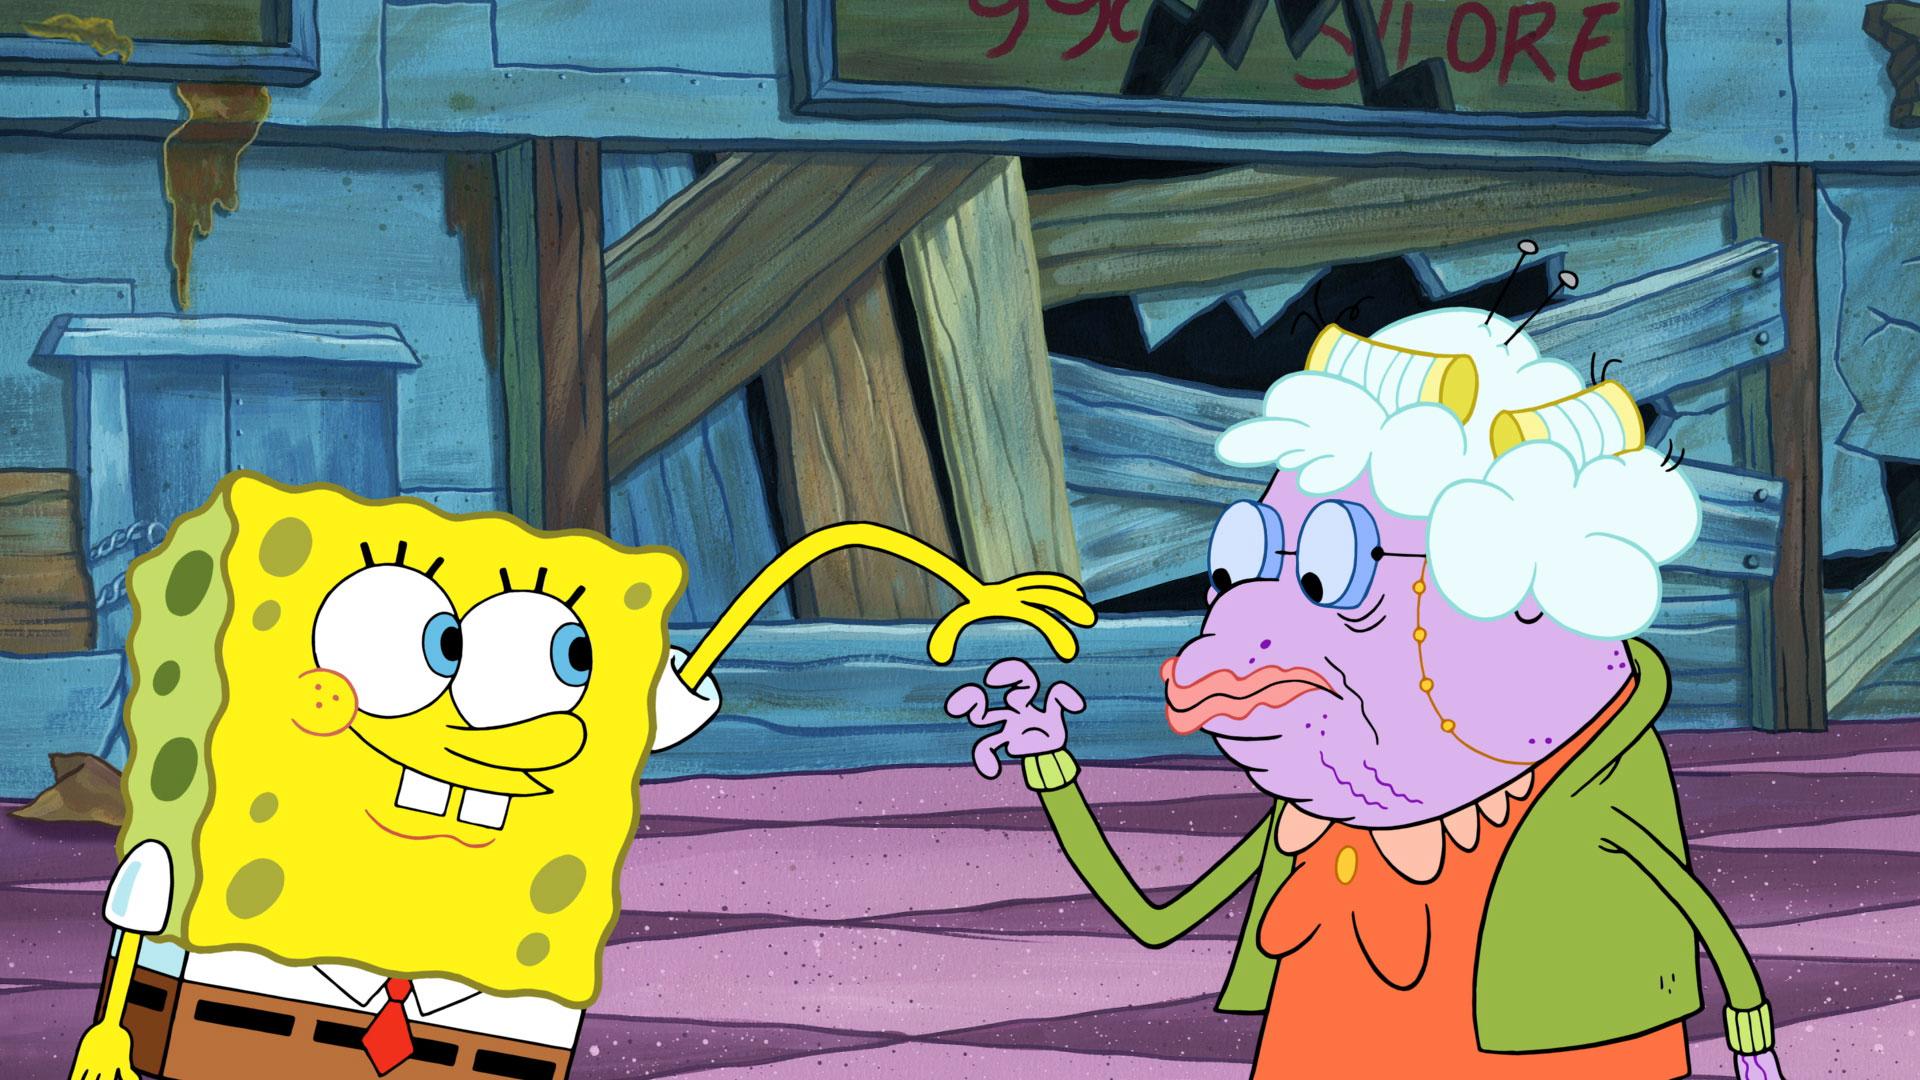 Betty White Gives A Sparkle To Spongebob Squarepants